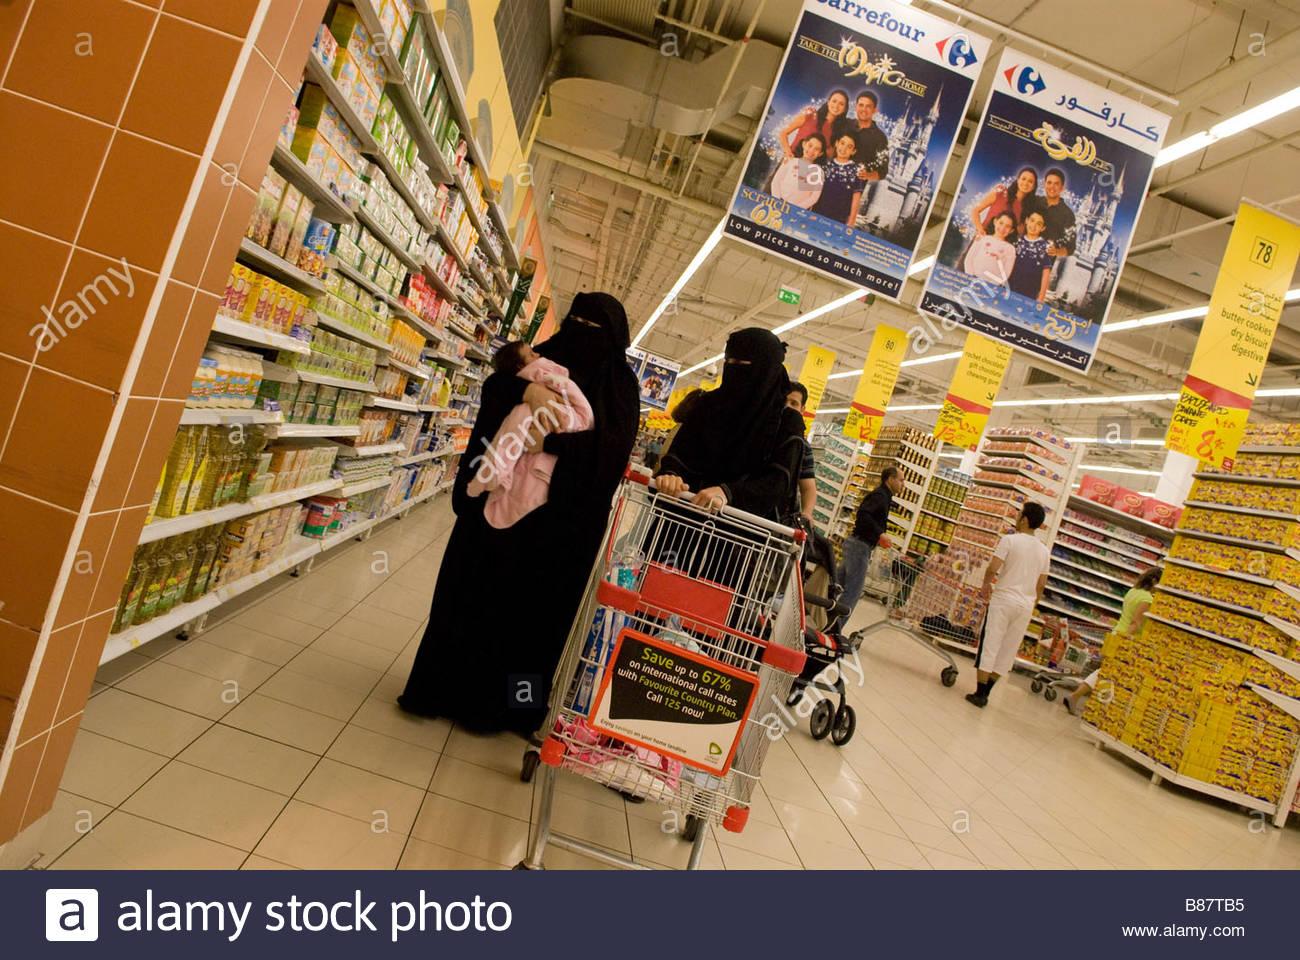 Dubai Uae Mall Of The Emirates Carrefour Supermarket Stock Photo